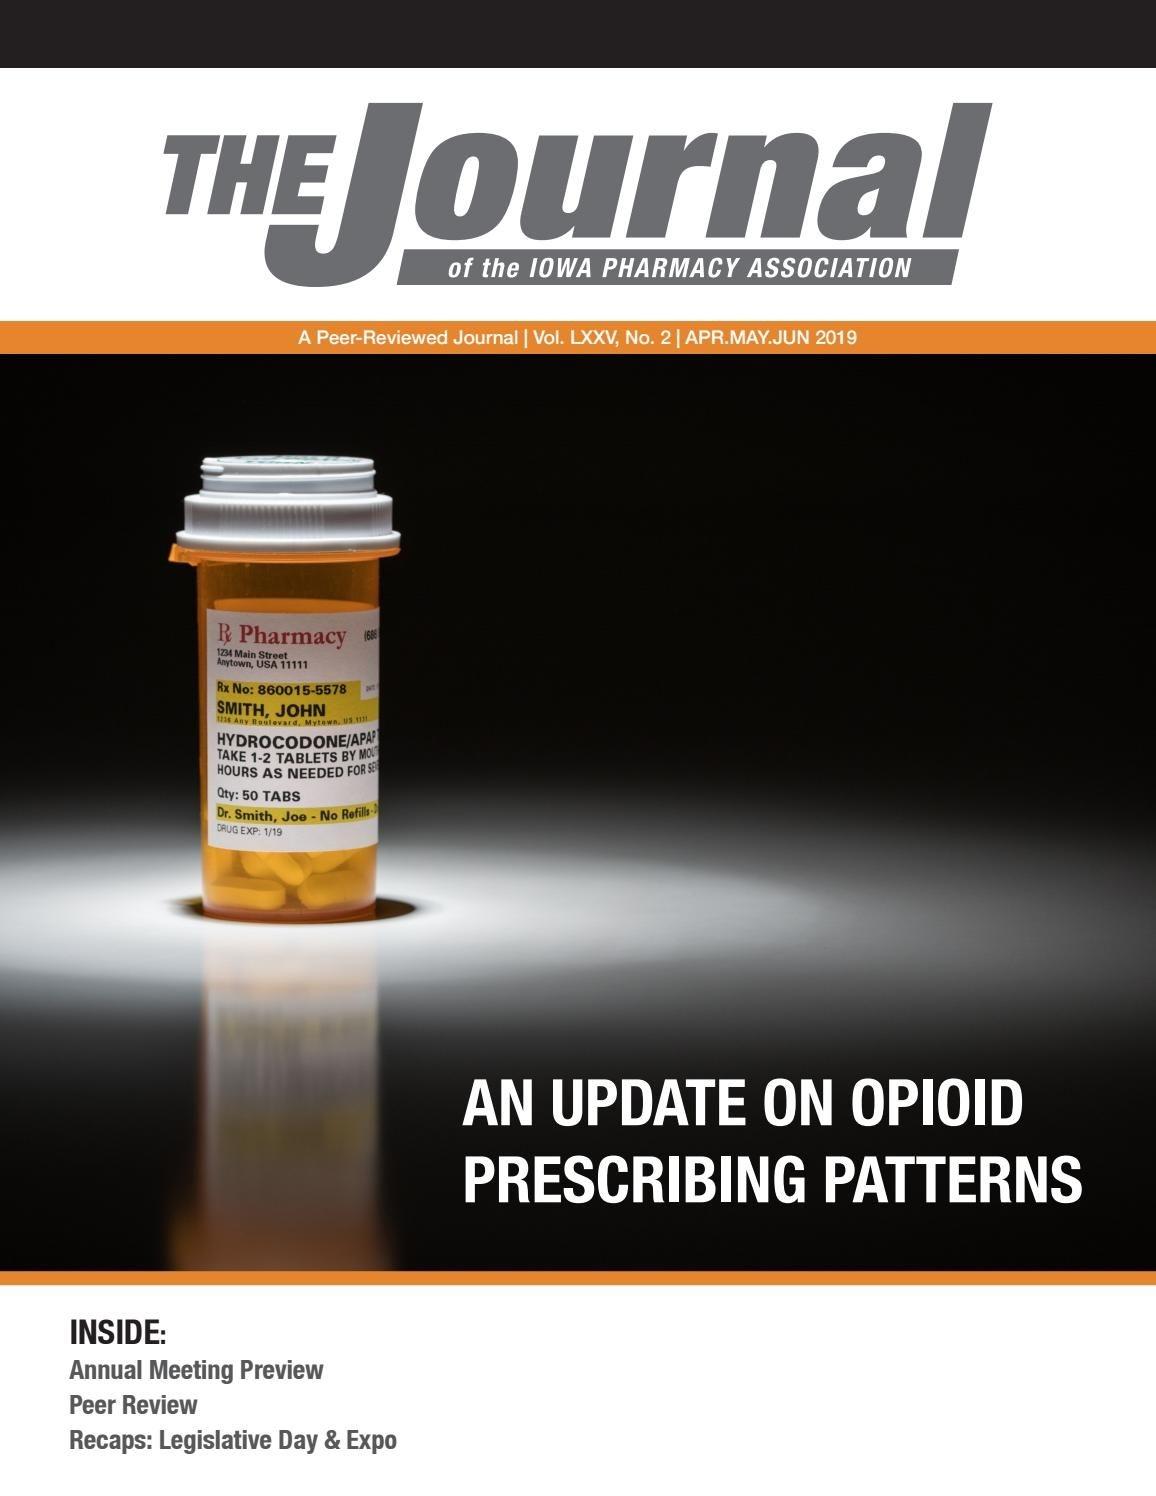 Ipa Journal - Apr/may/jun 2019 By Iowa Pharmacy Association